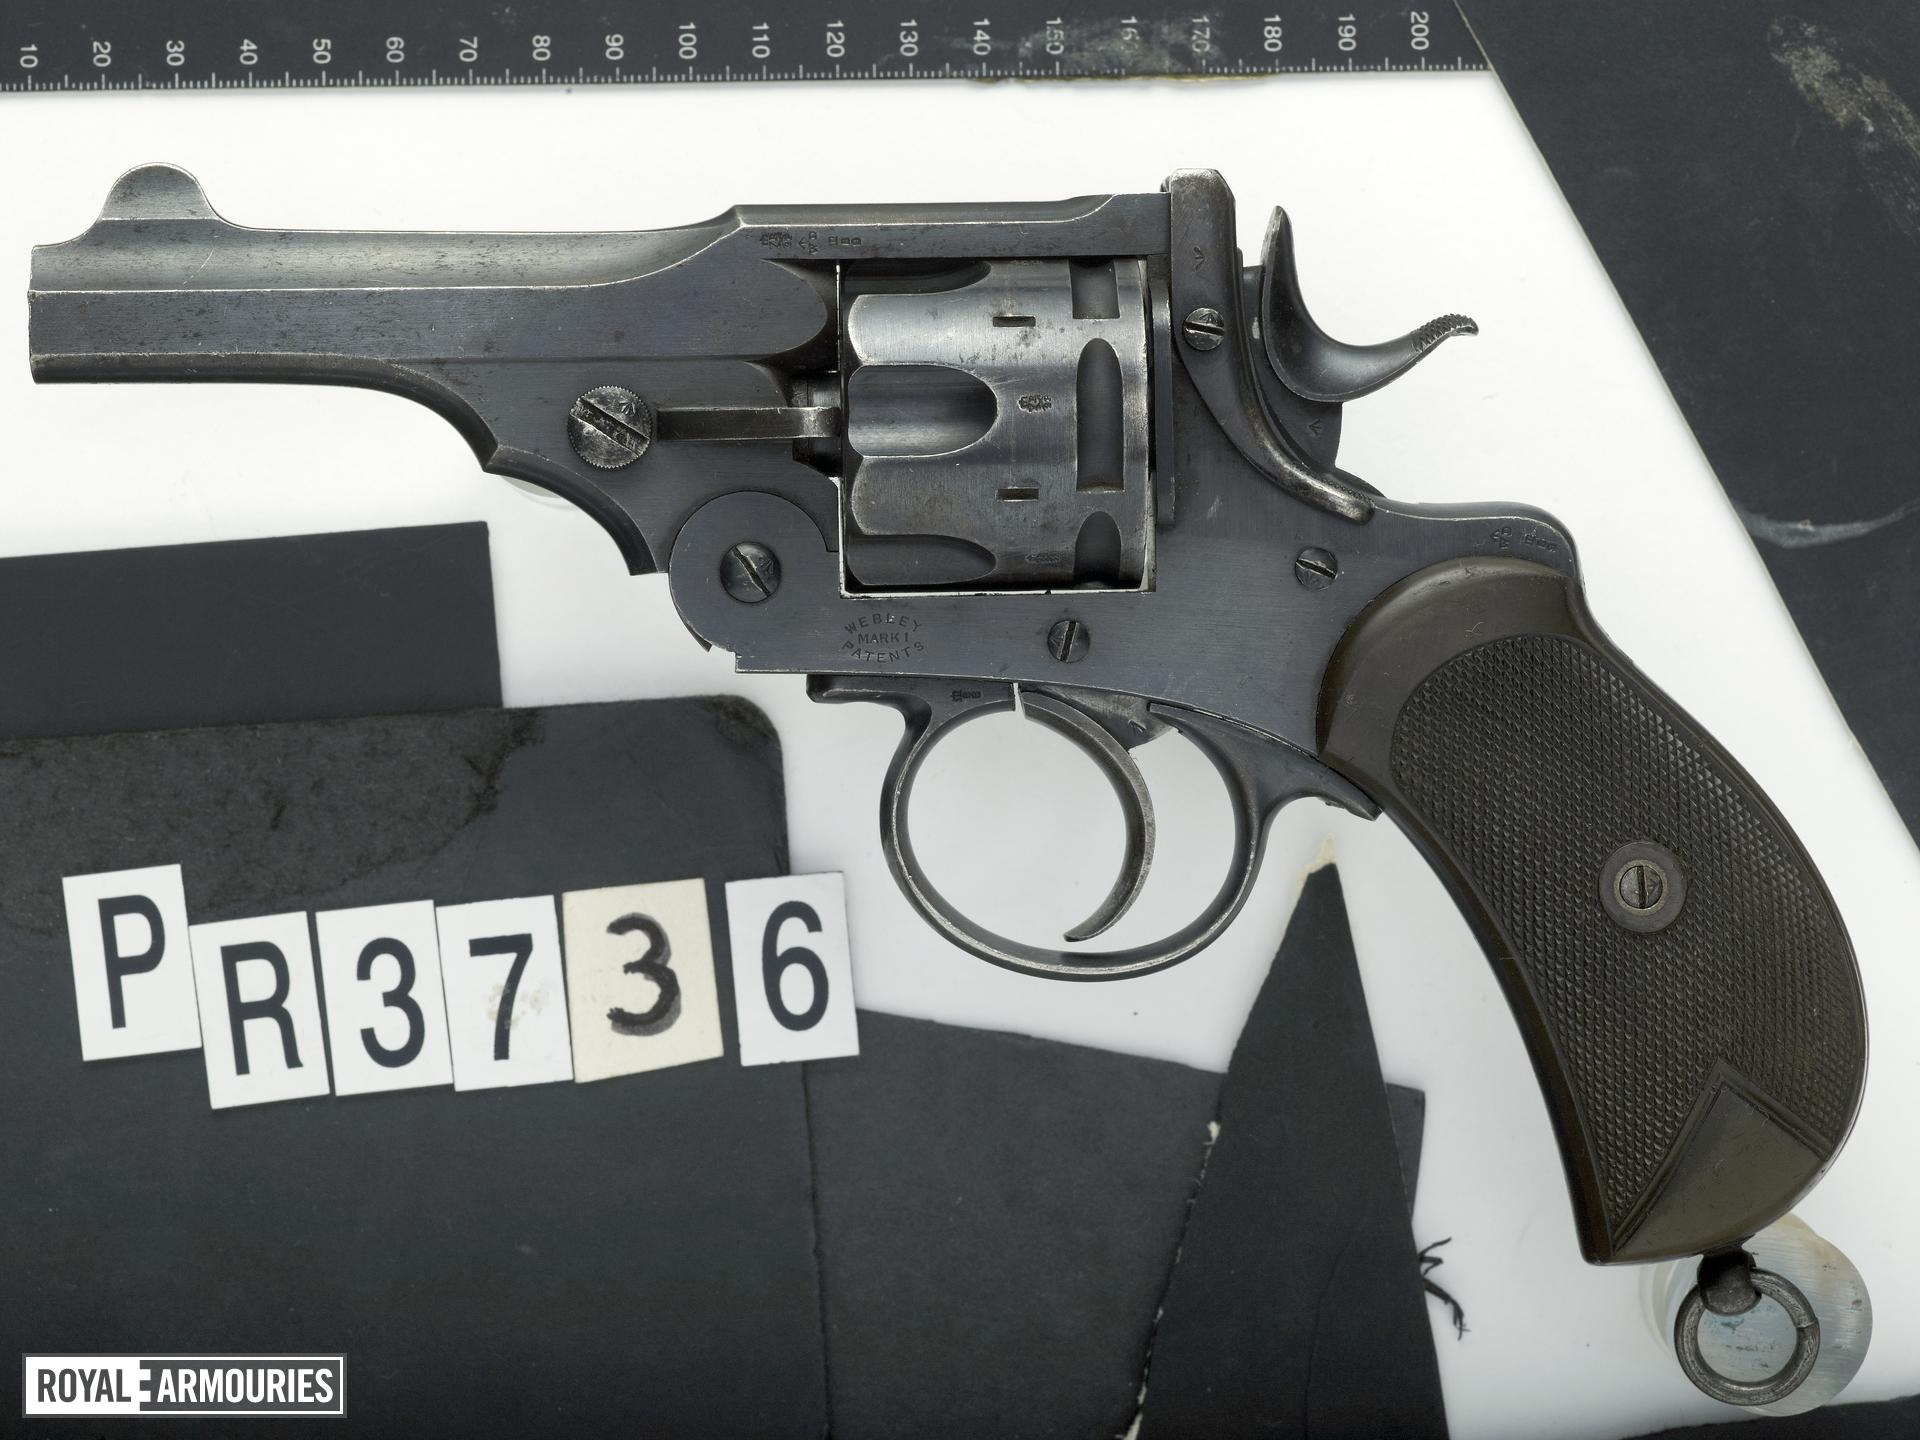 Centrefire six-shot revolver - Webley Mk.I